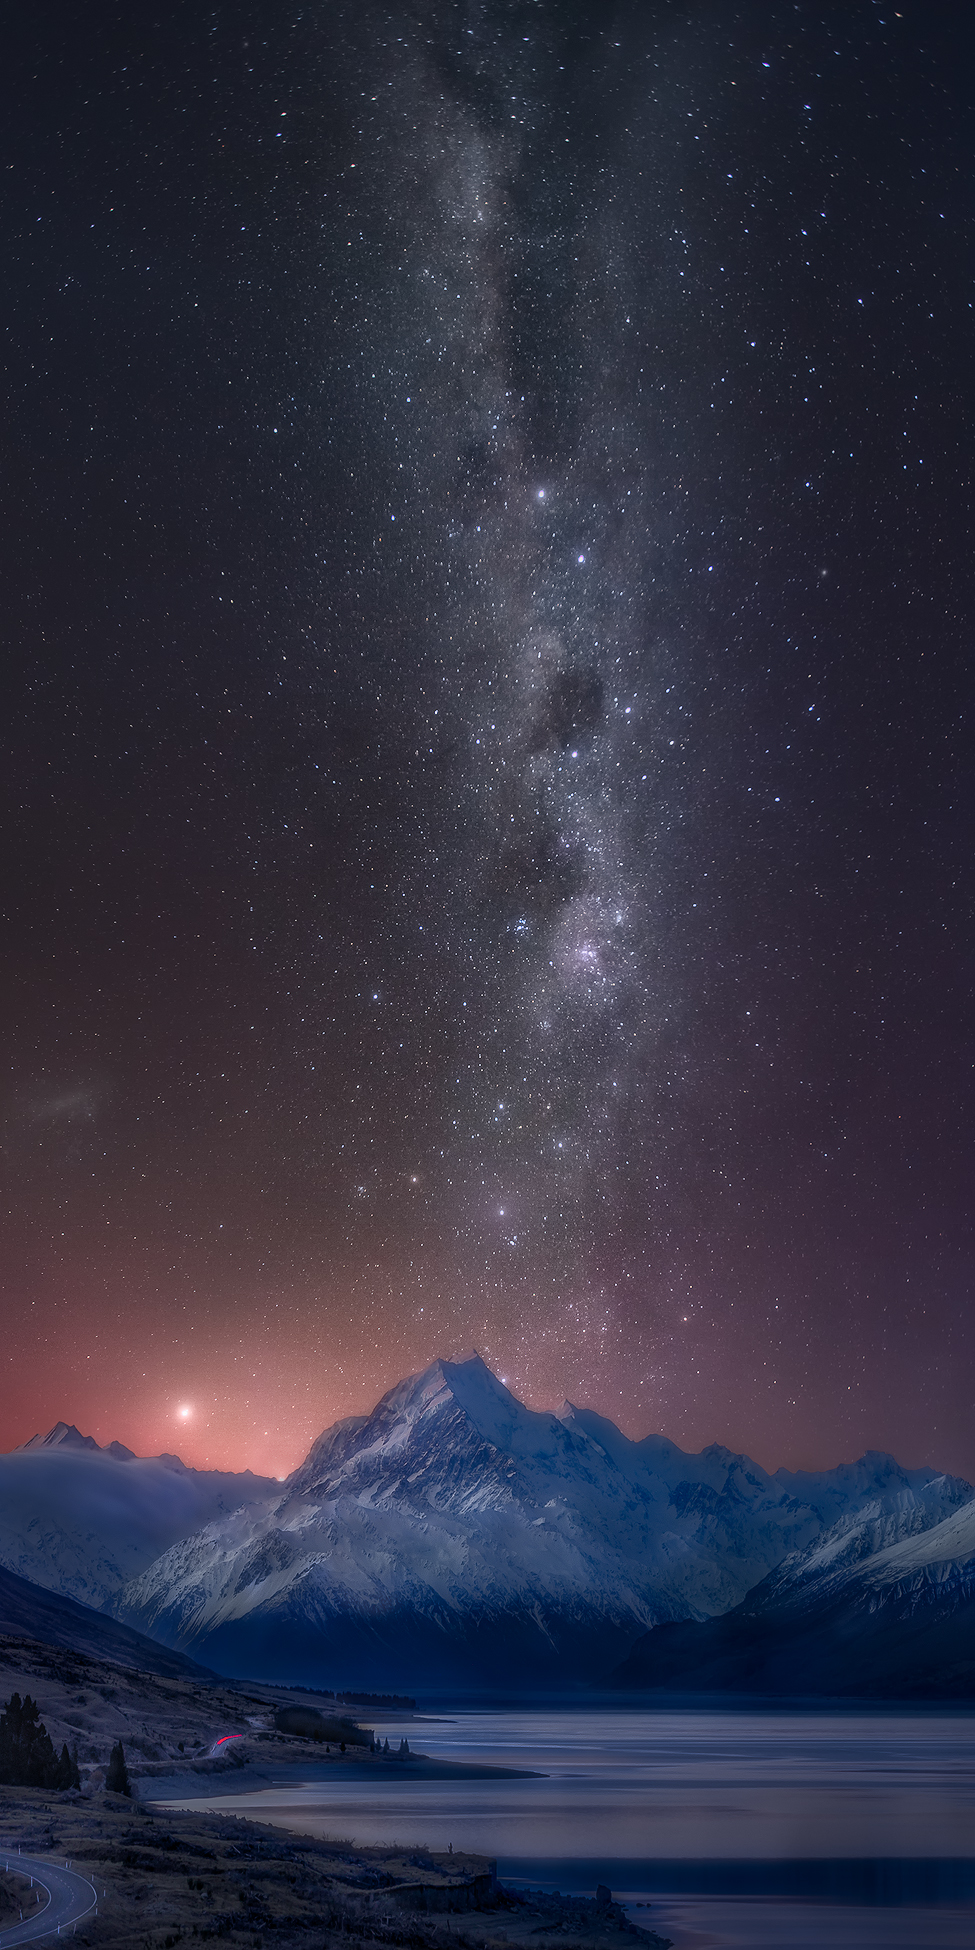 Milky Way Mount Cook New Zealand | Landscape Fine Art Photography print for sale by Karolin Schild